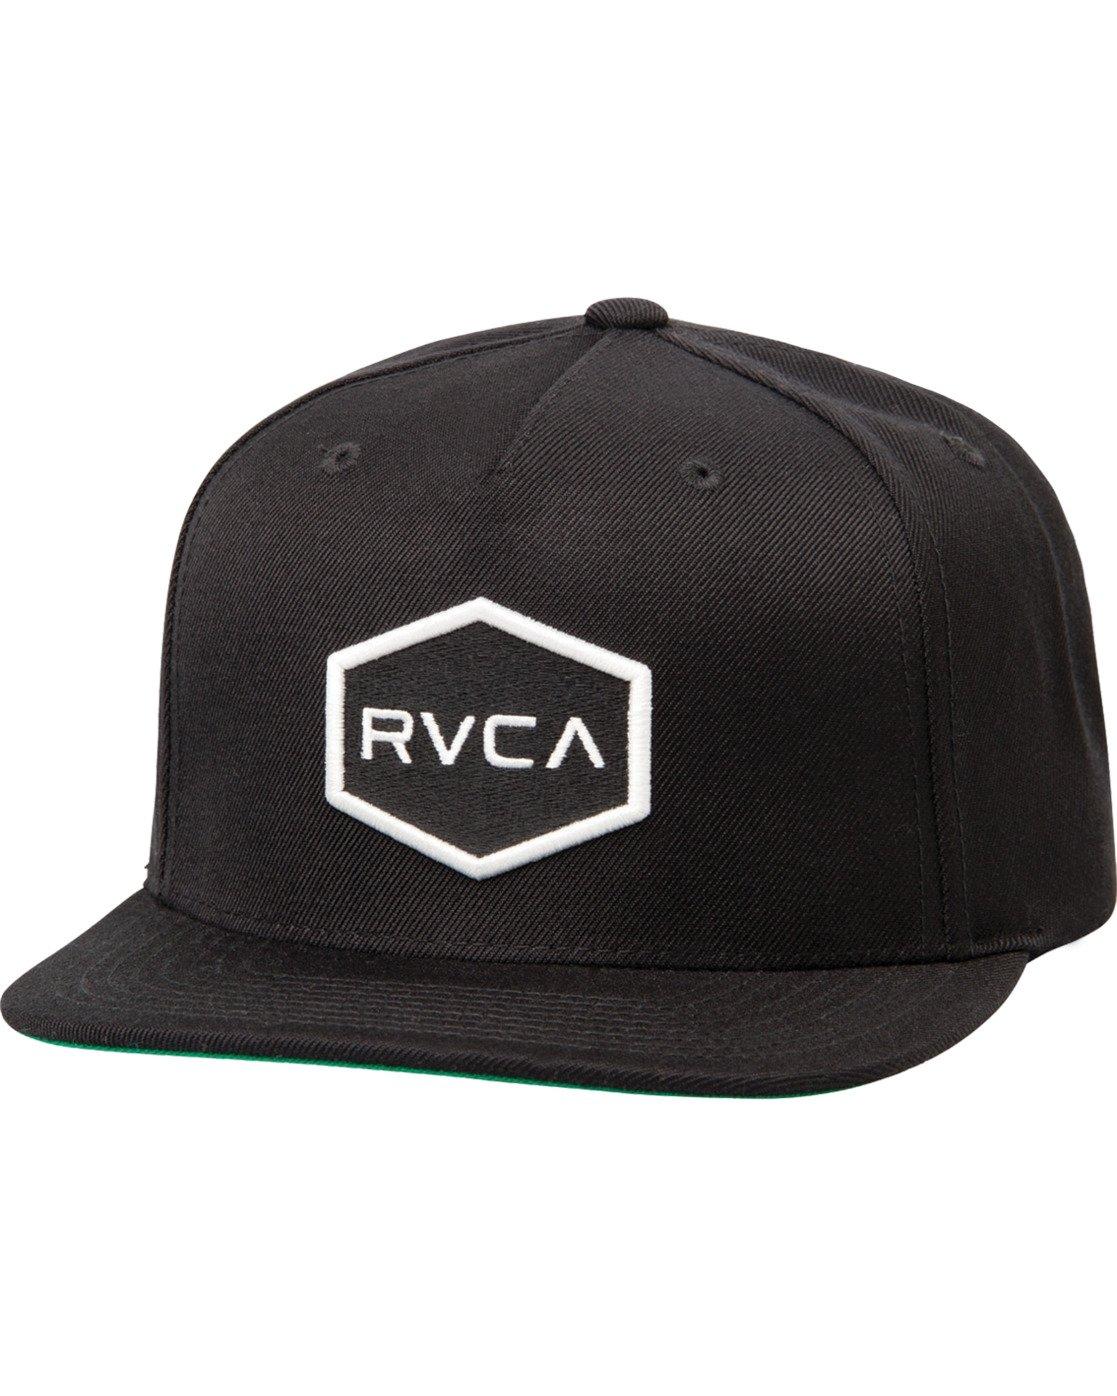 0 Commonwealth Snapback Hat Black MDAHWCWS RVCA